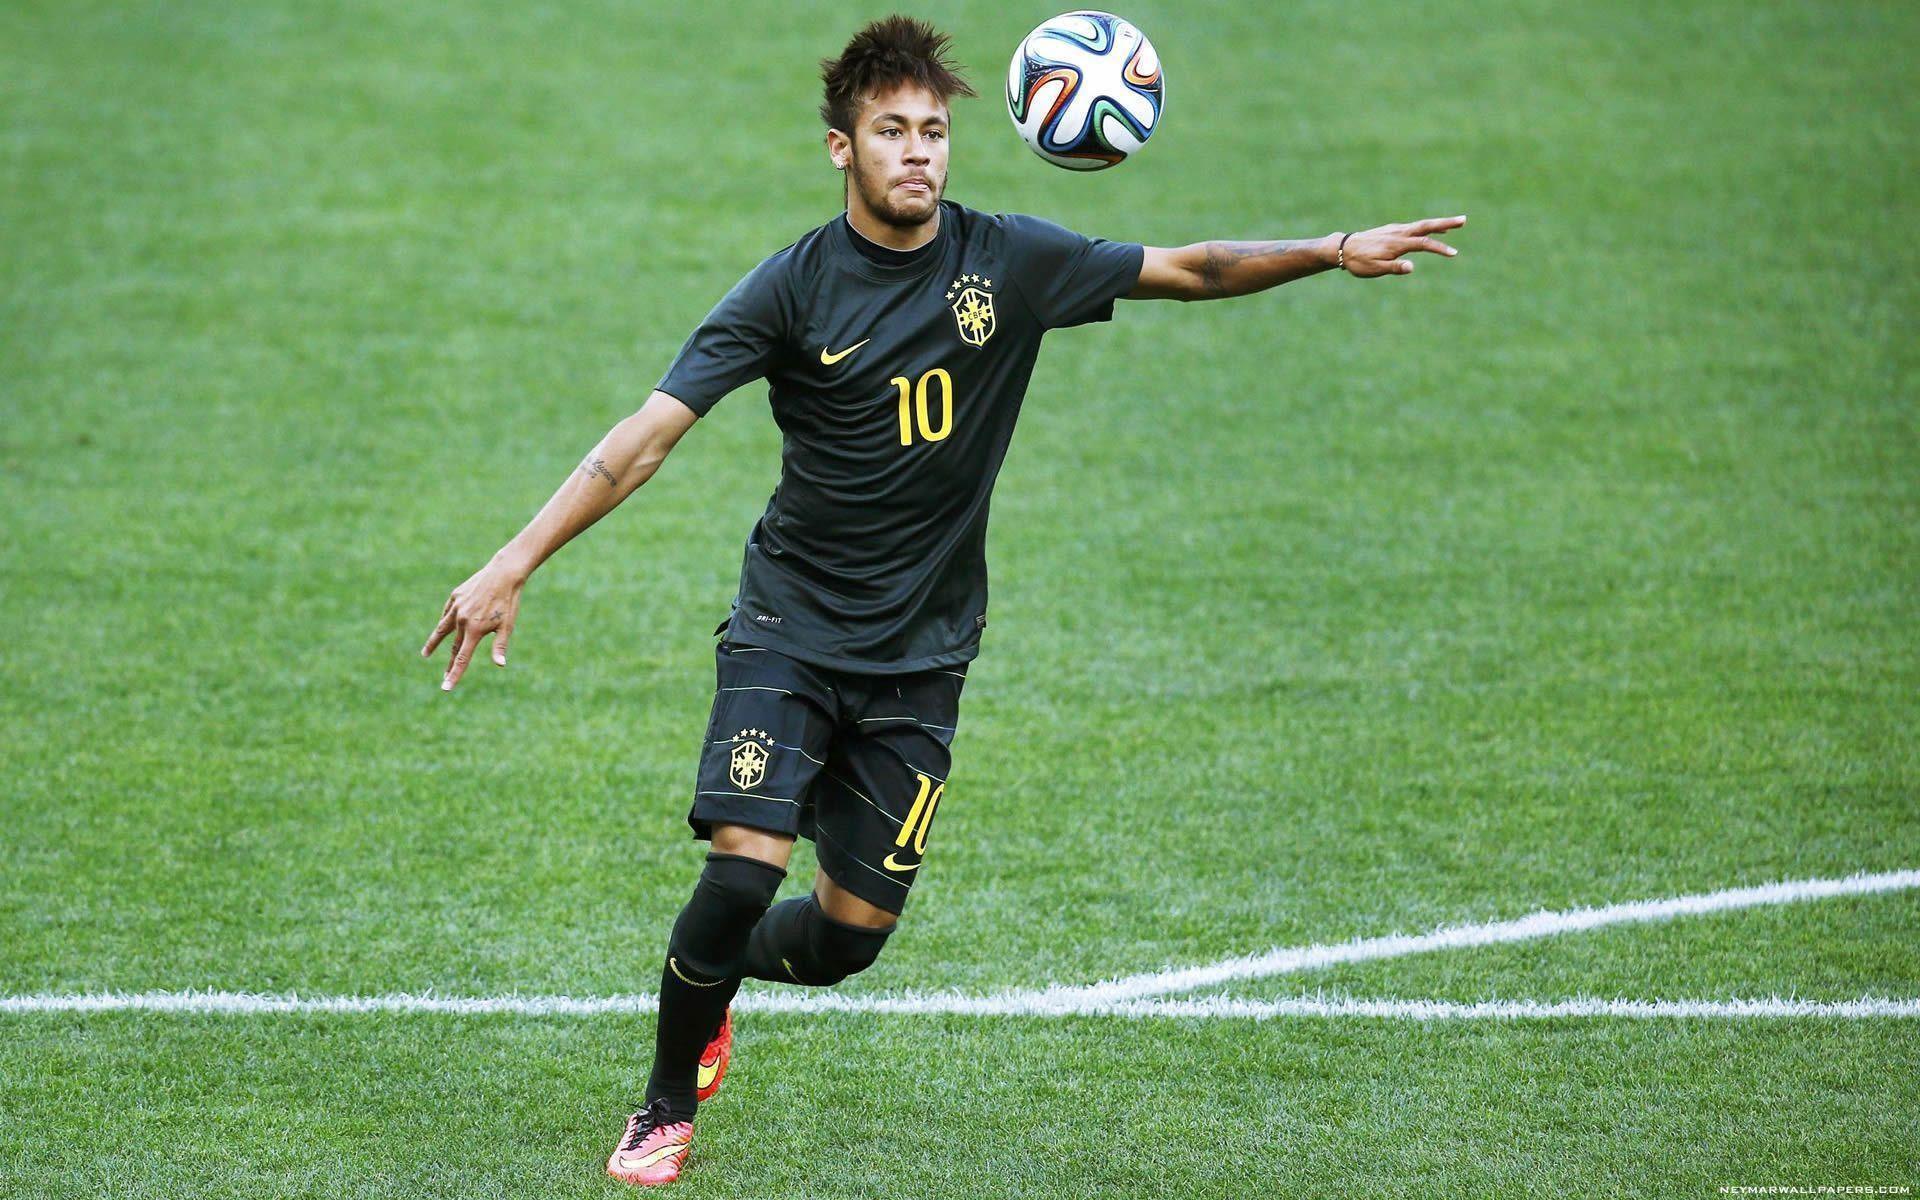 Neymar Backgrounds Brazil Flag 2016 - Wallpaper Cave